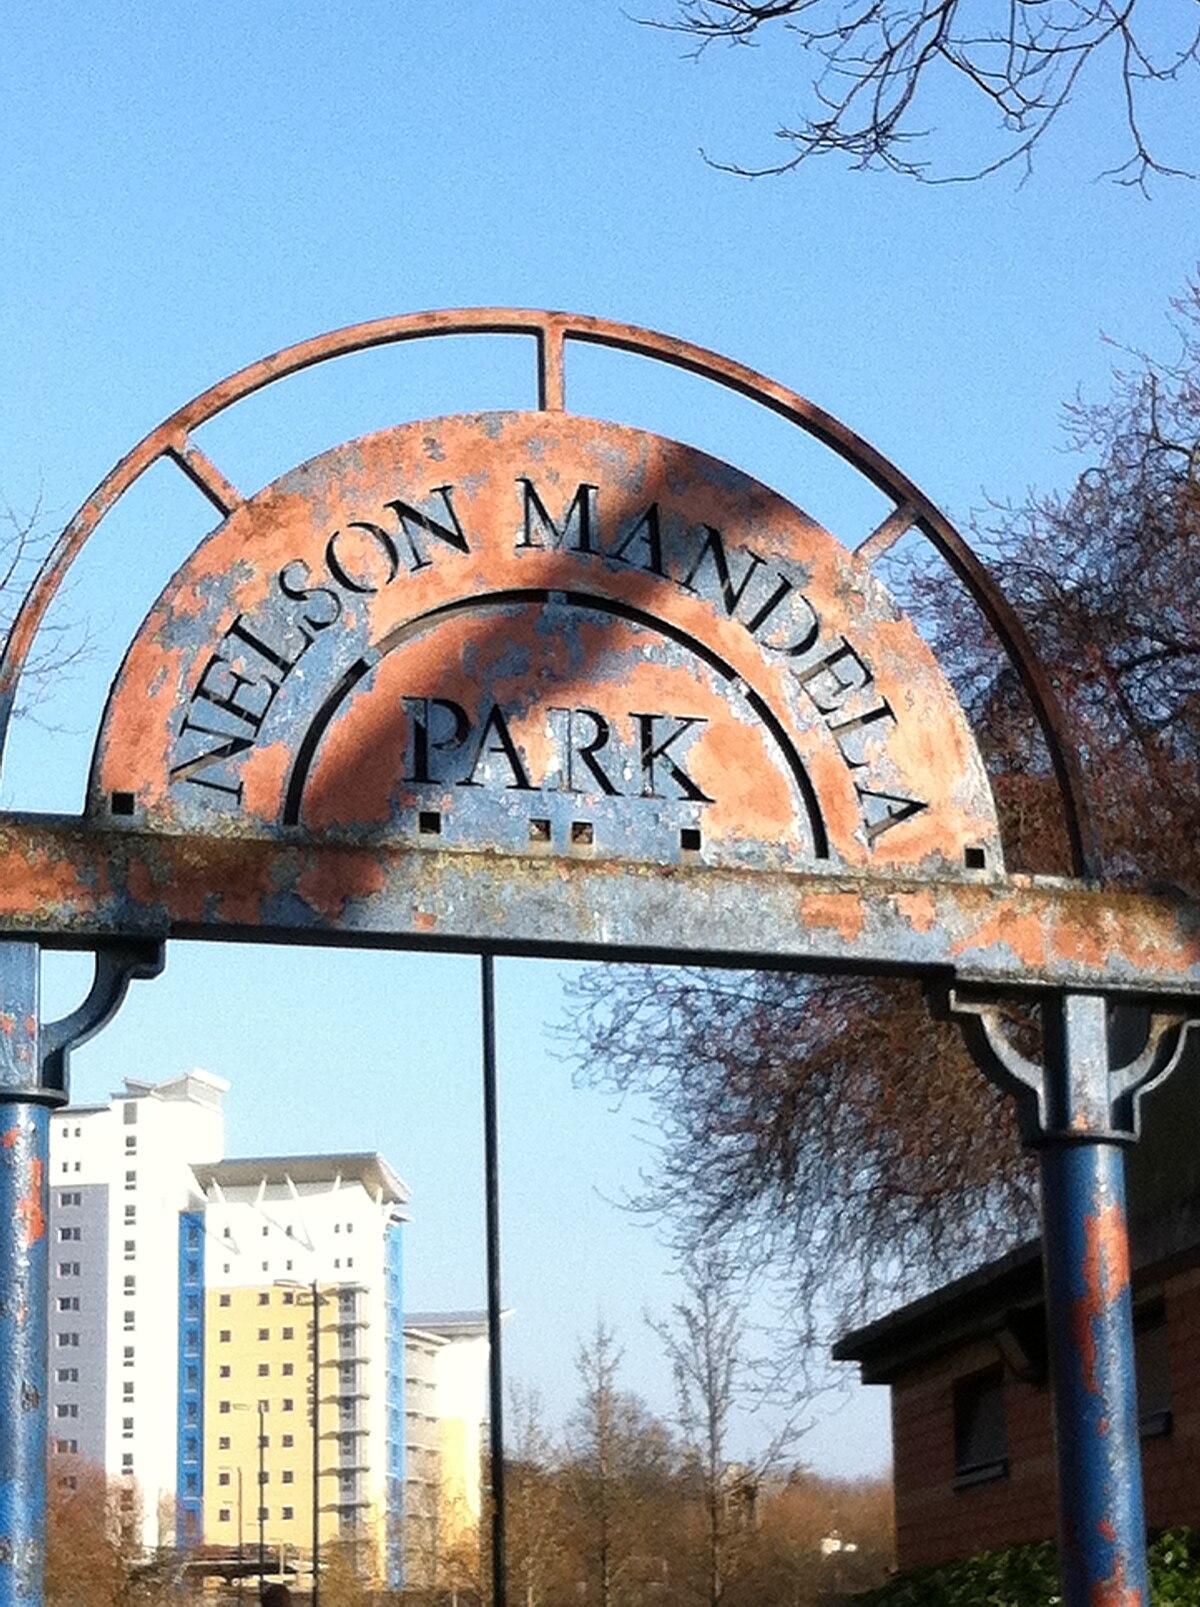 nelson mandela park simple english wikipedia the free